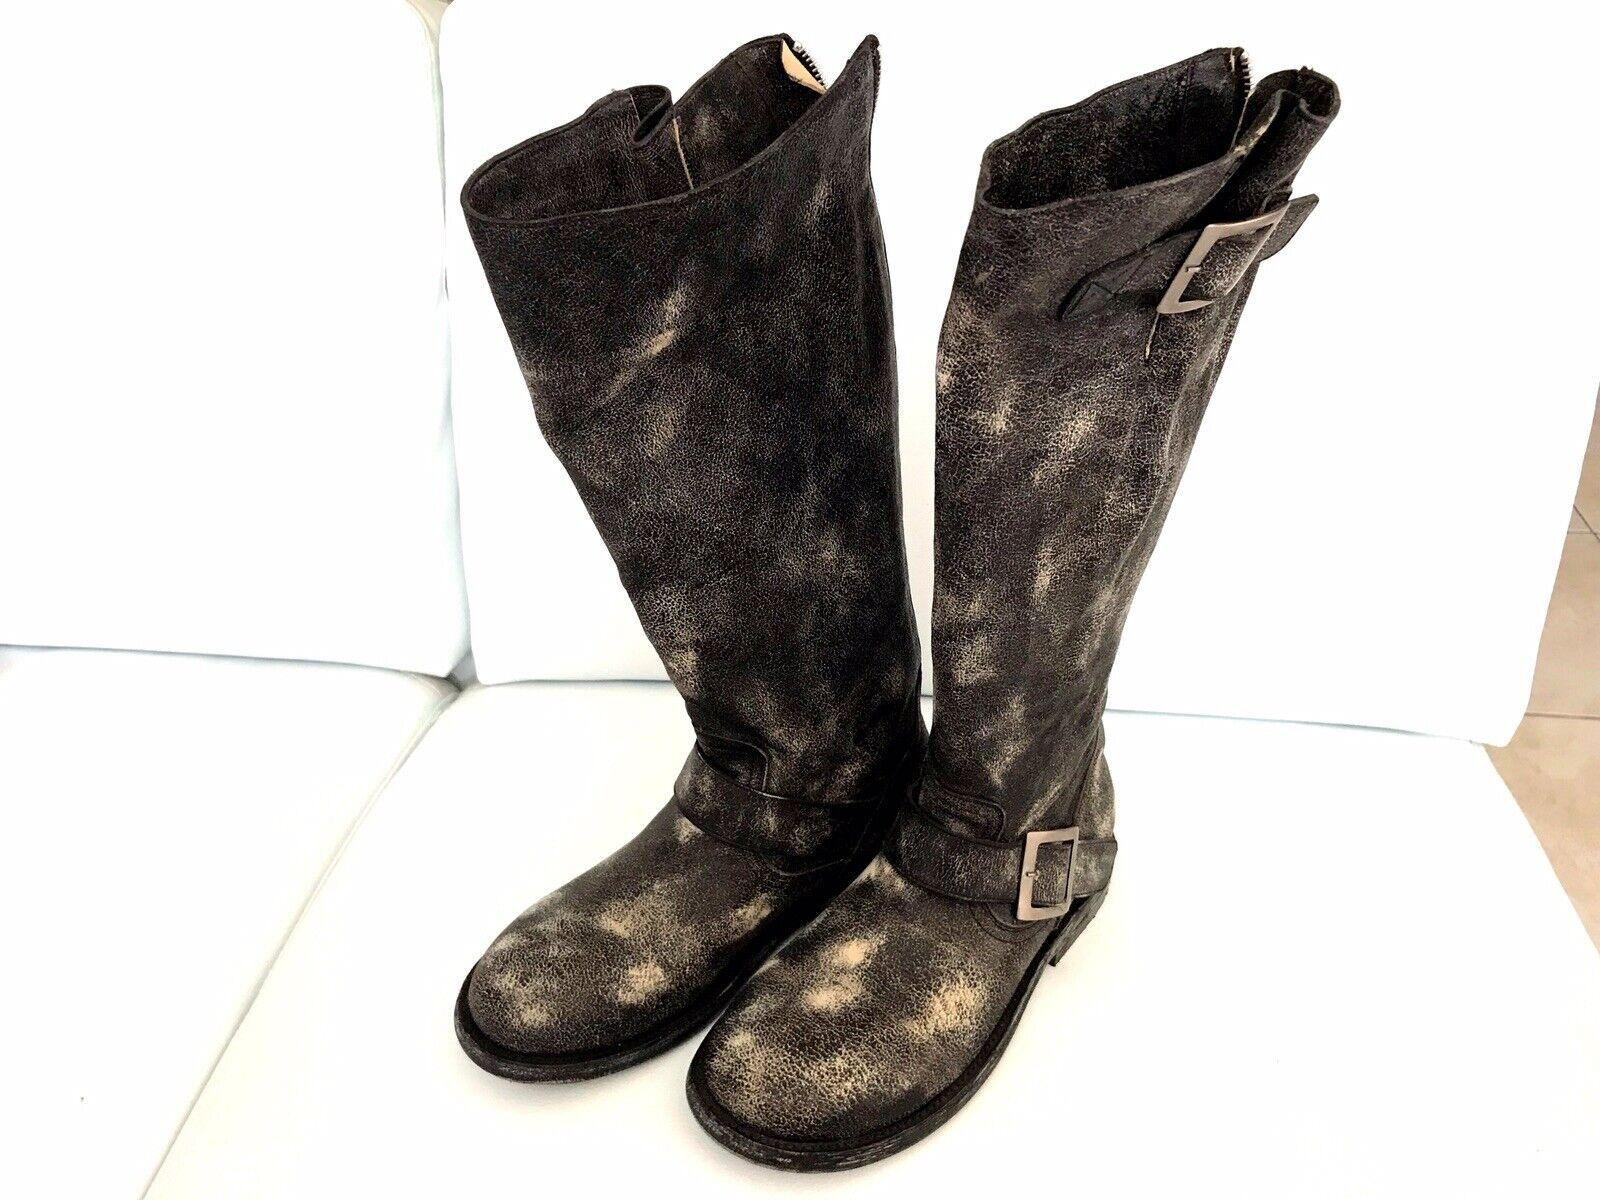 botas Femme Mexicana Old Gringo Cuir marrón Talla 36